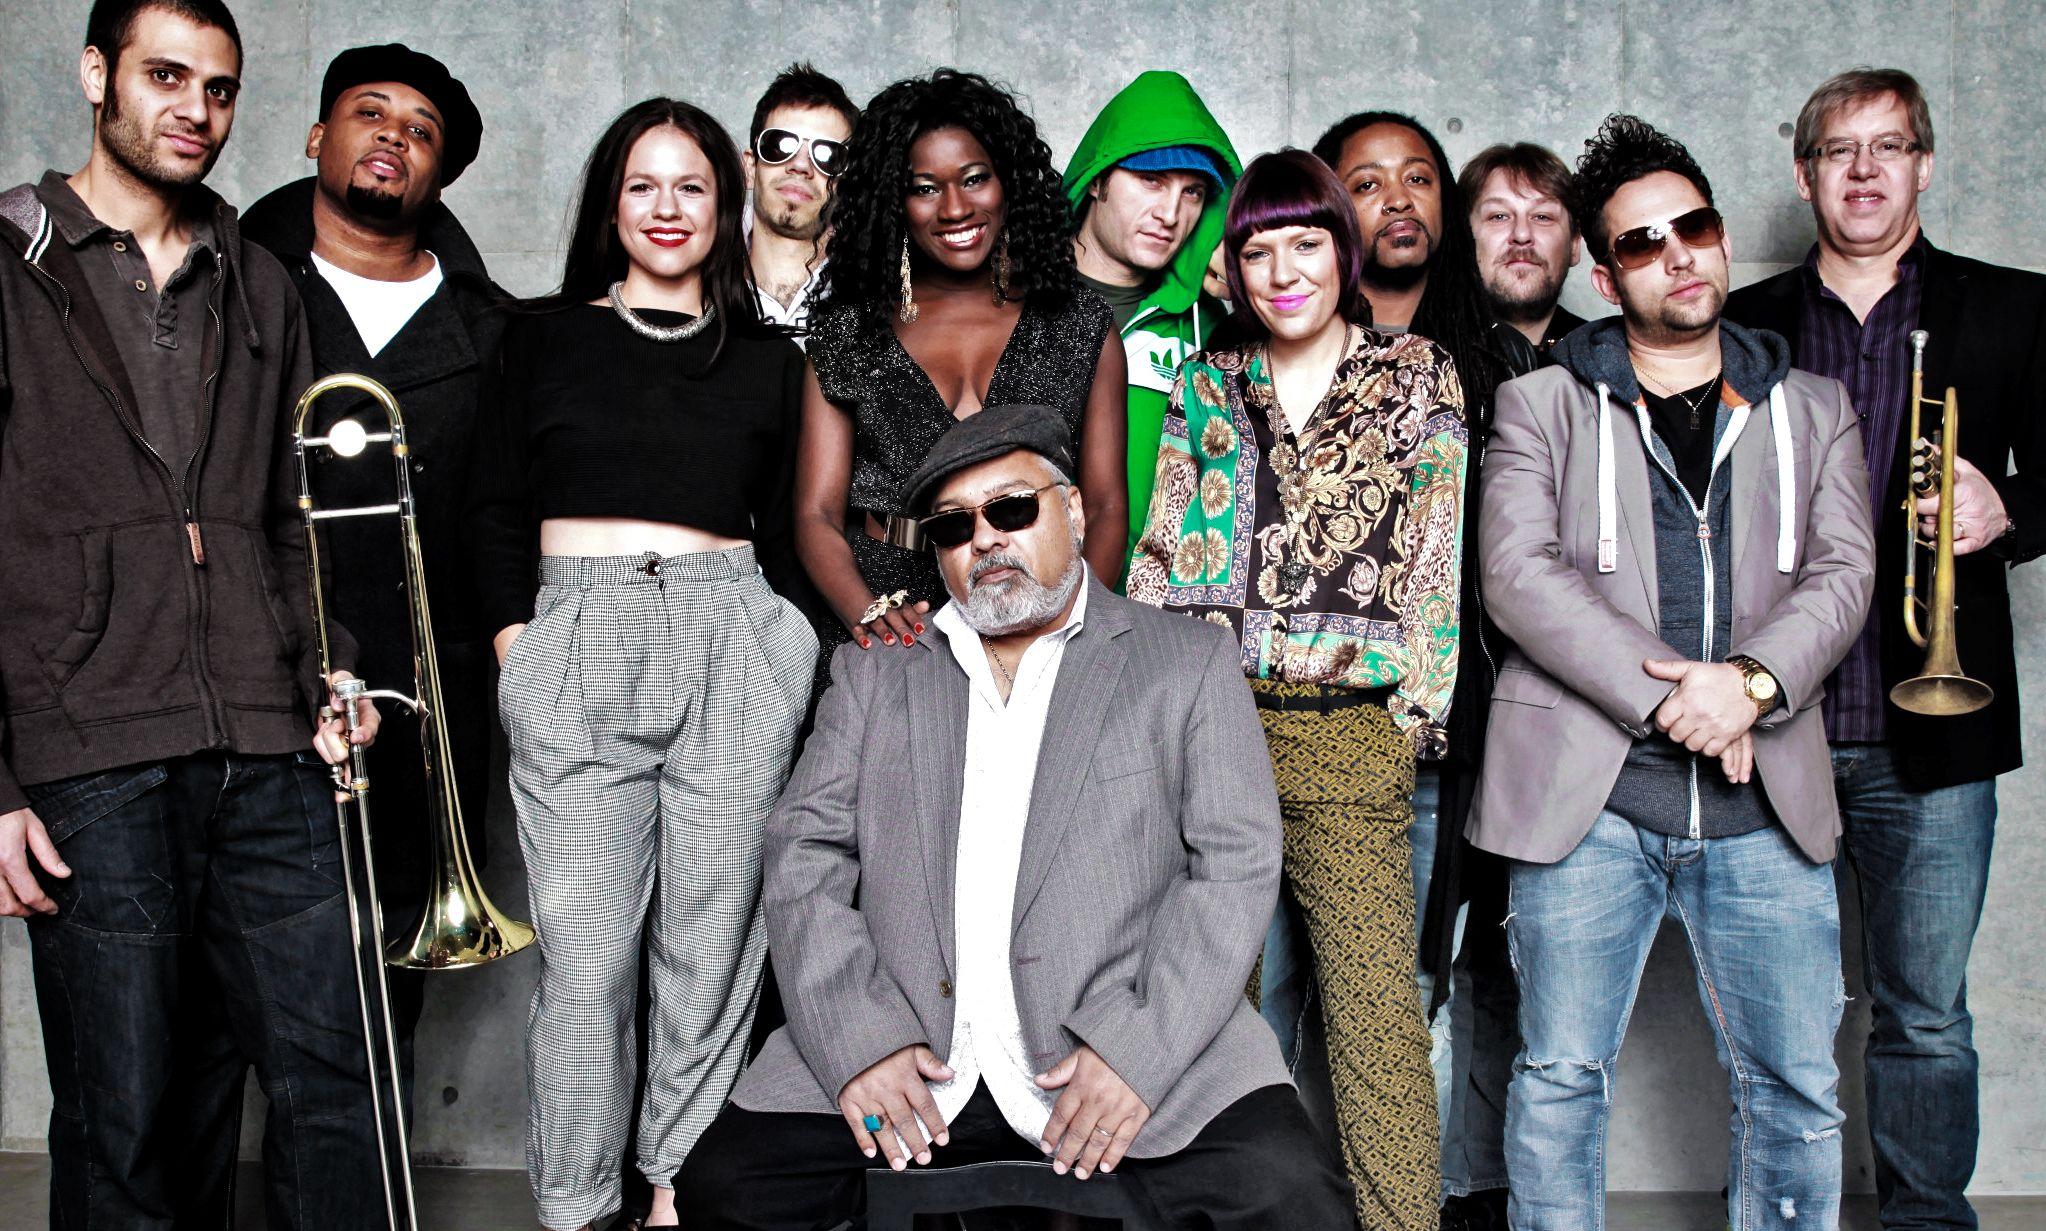 Incognito Band Incognito Uk Music Jazz Funk